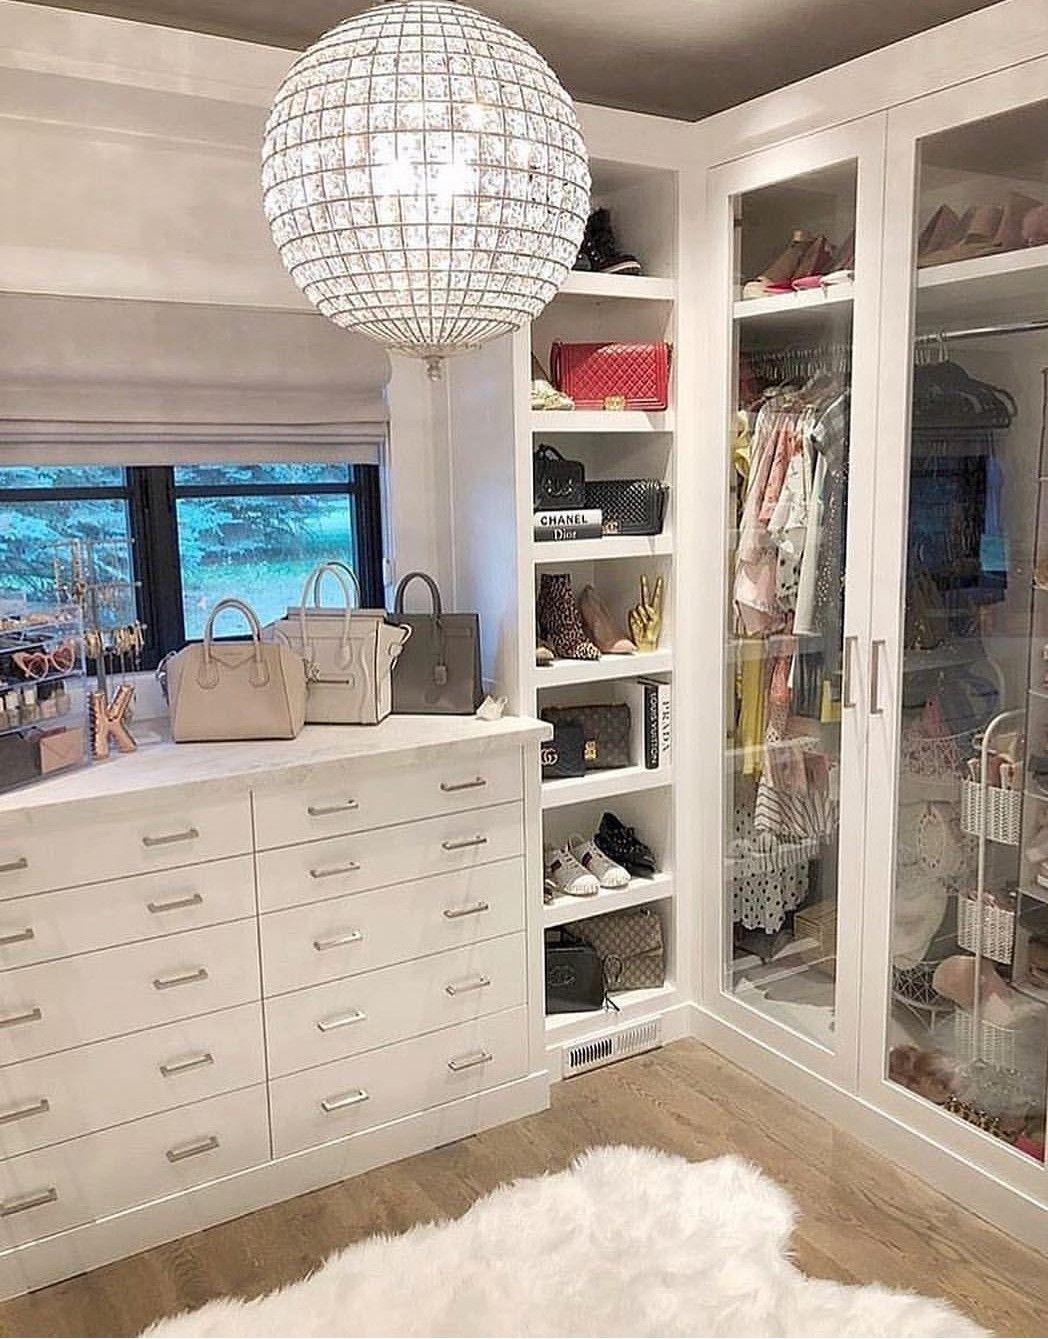 𝒇 ℓℓ 𝒘 Rainmoneyy With Images Dream Closet Design Closet Decor